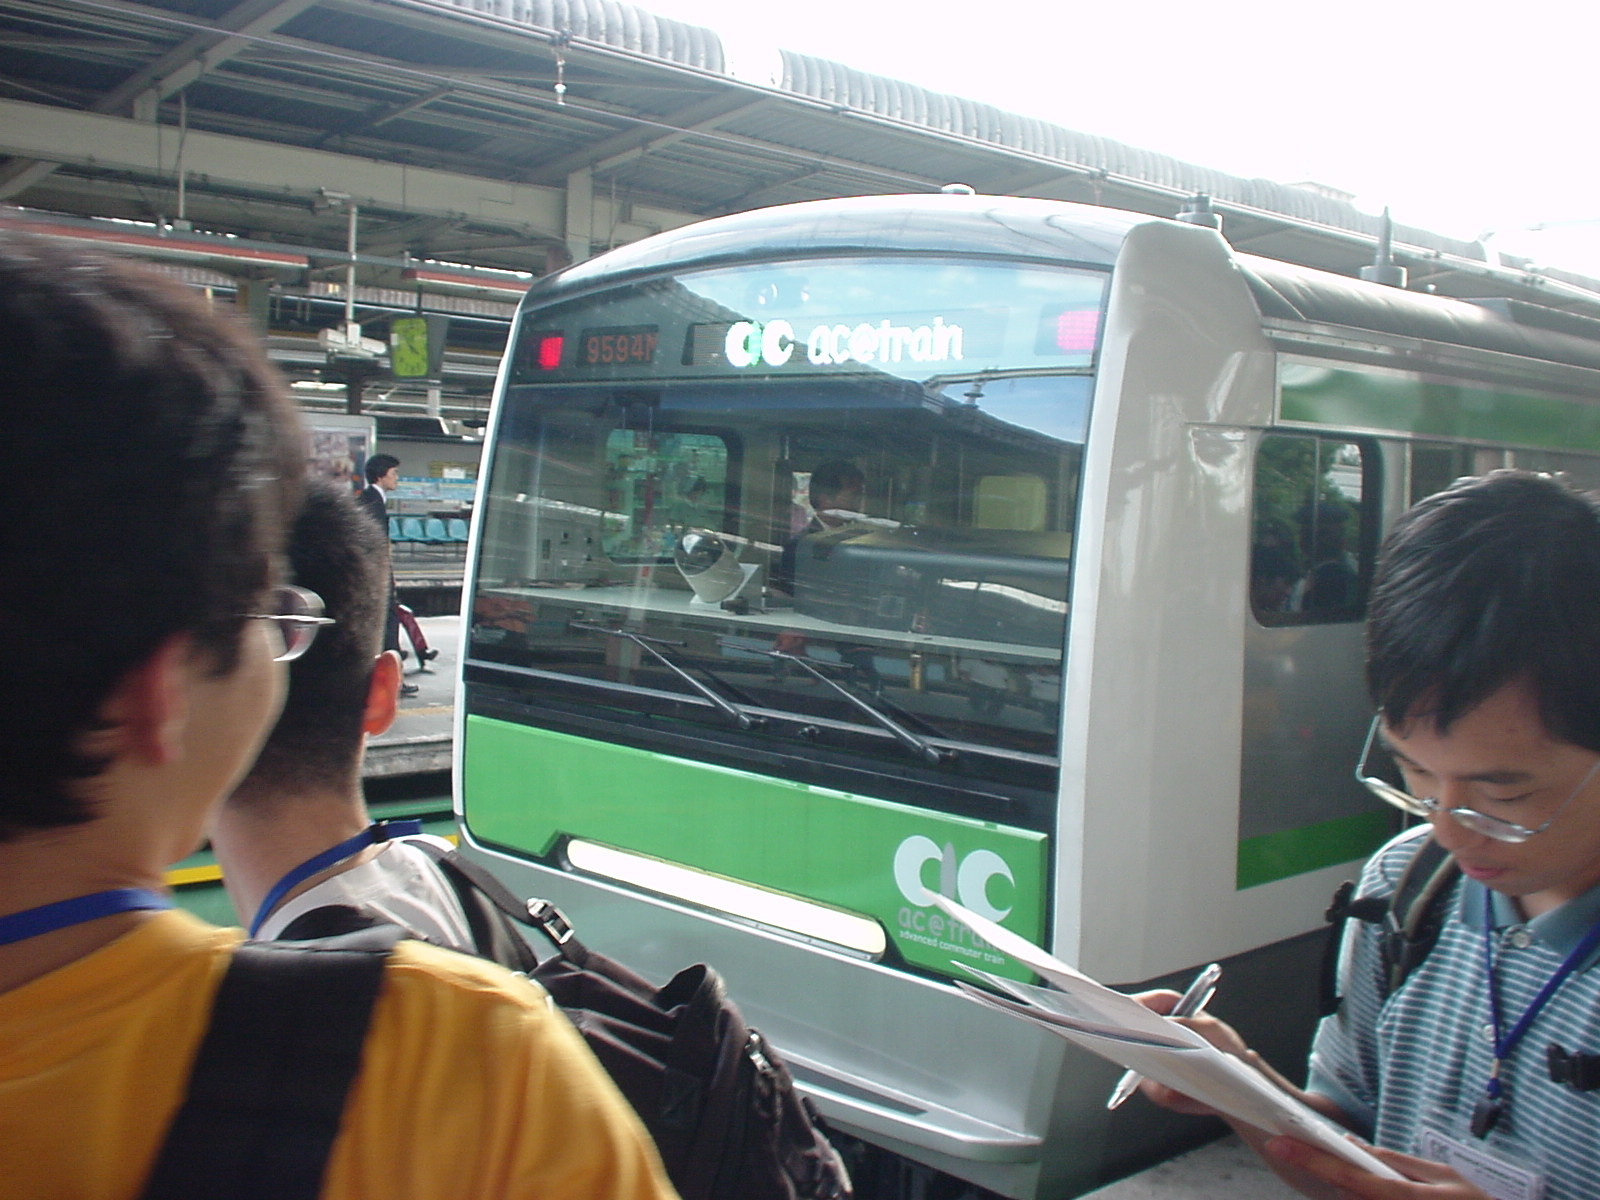 【ACトレイン】E231系登場から20年 固い座席が採用された理由とは? ACトレインの功績とは?